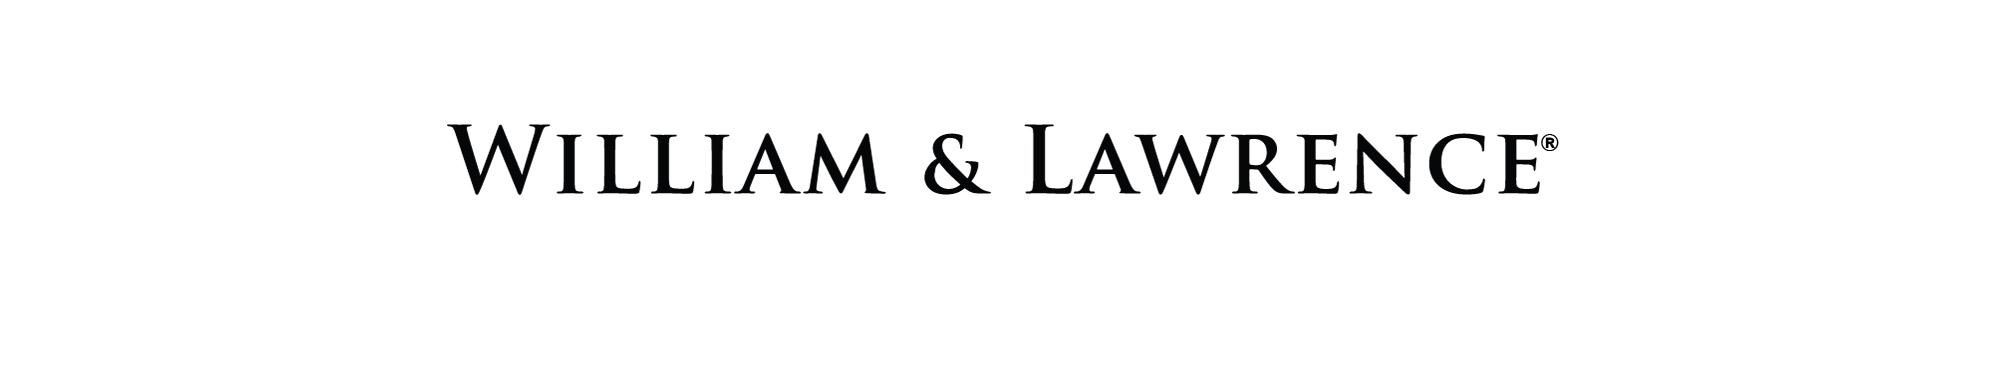 William & Lawrence Logo